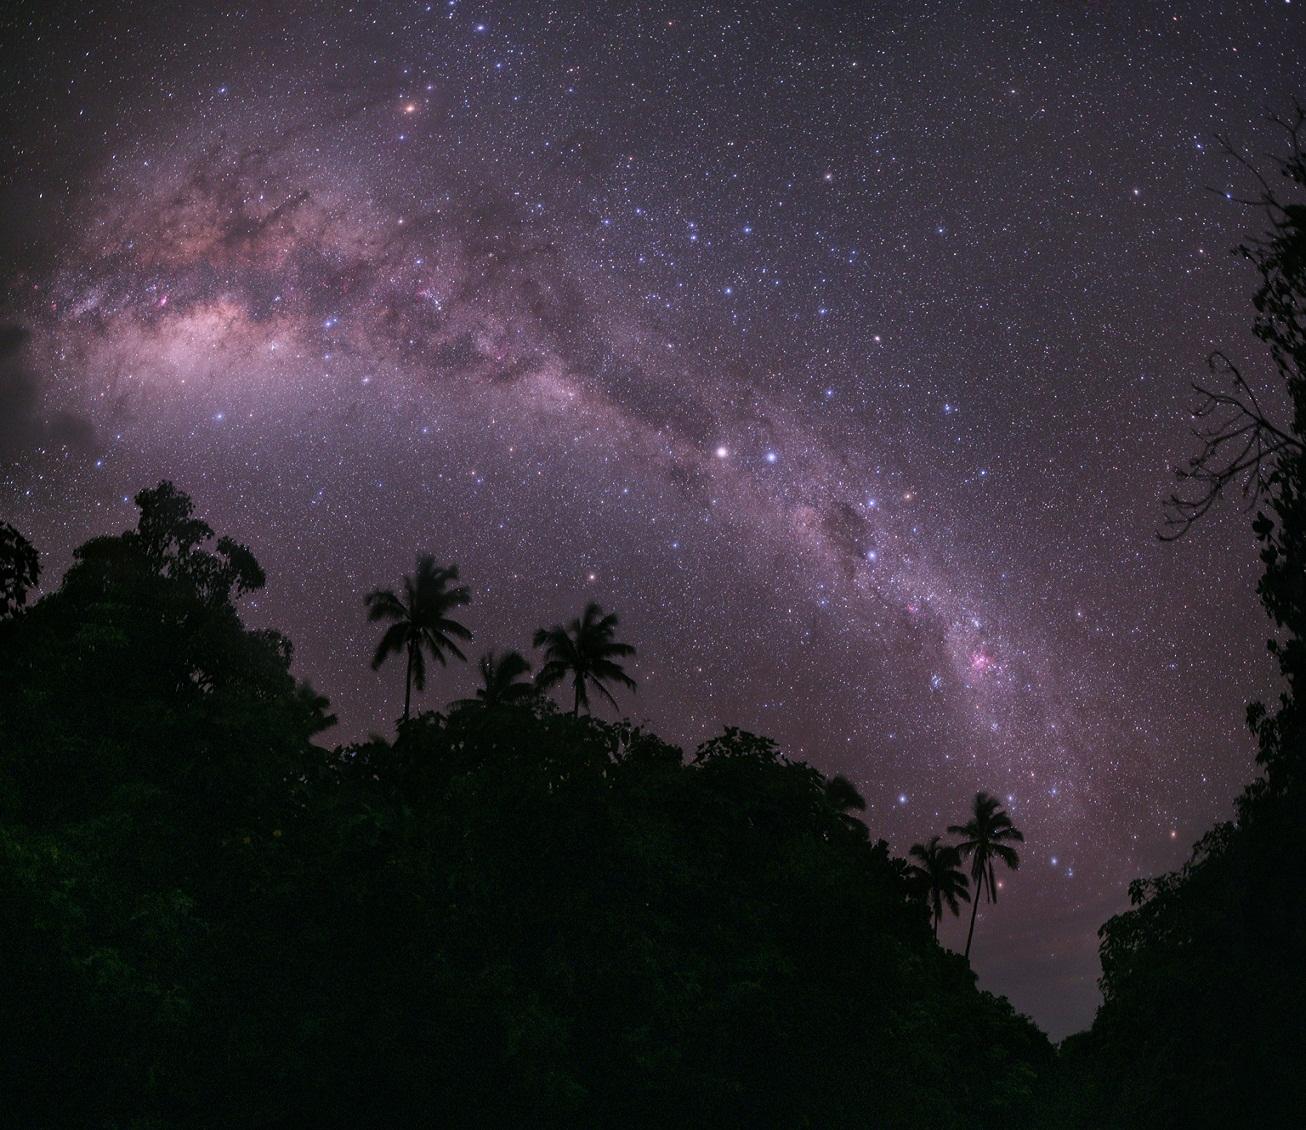 denser in middle night sky milky way galaxy - photo #28